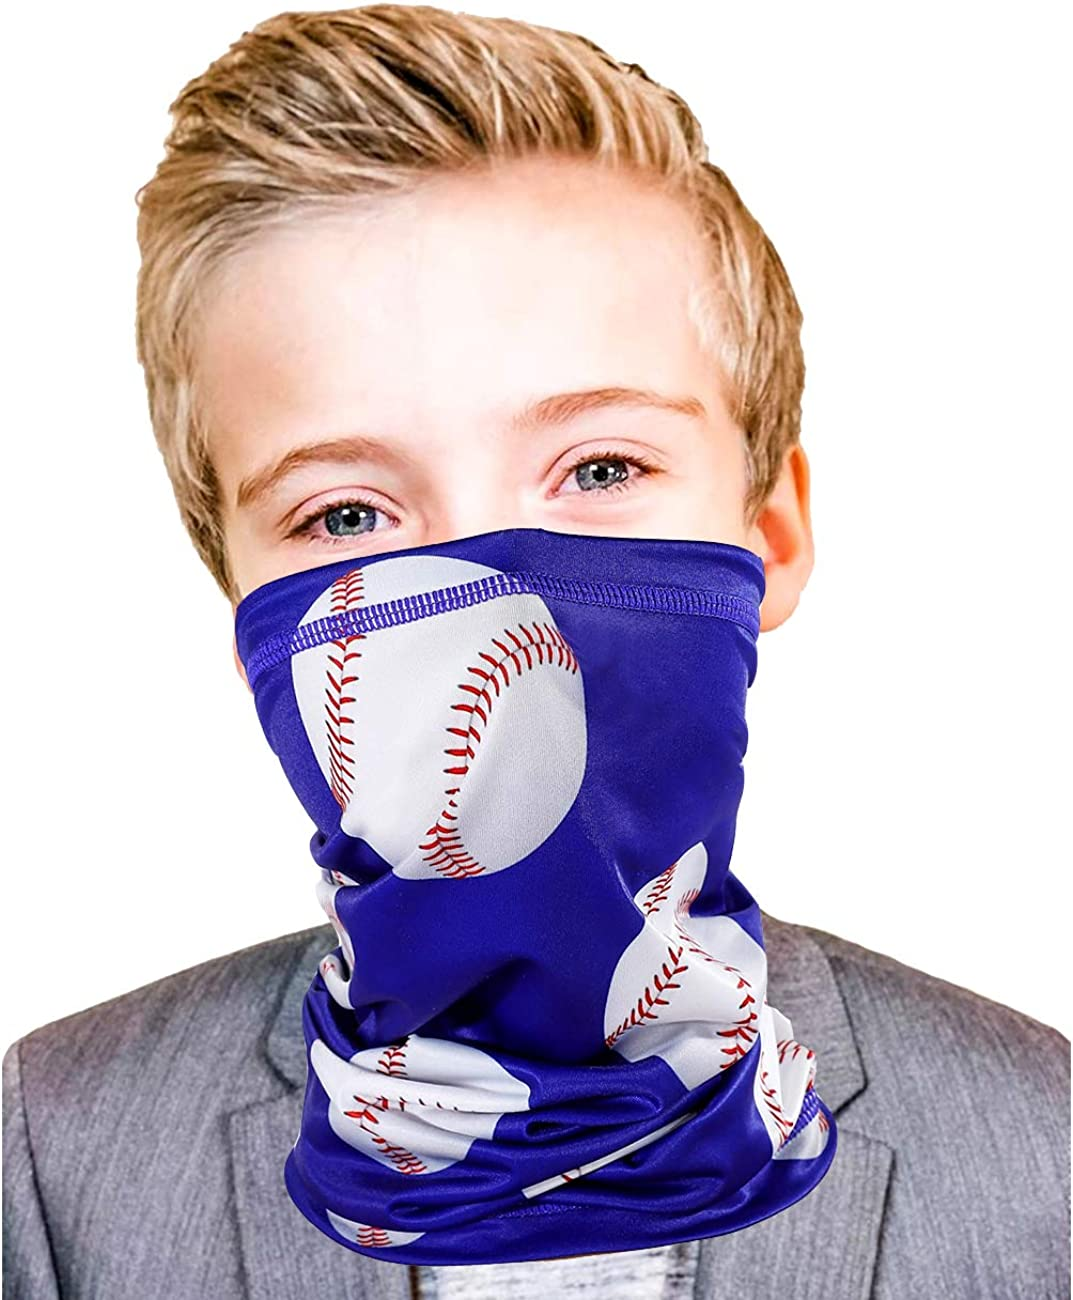 Kids Gator Mask Baseball Boys Gift Face Gaiter Bandanas 4-12 Years Old Youth Gaitor UV Sun Protection Outdoor Sport Themed Fishing Masks (Baseball): Clothing